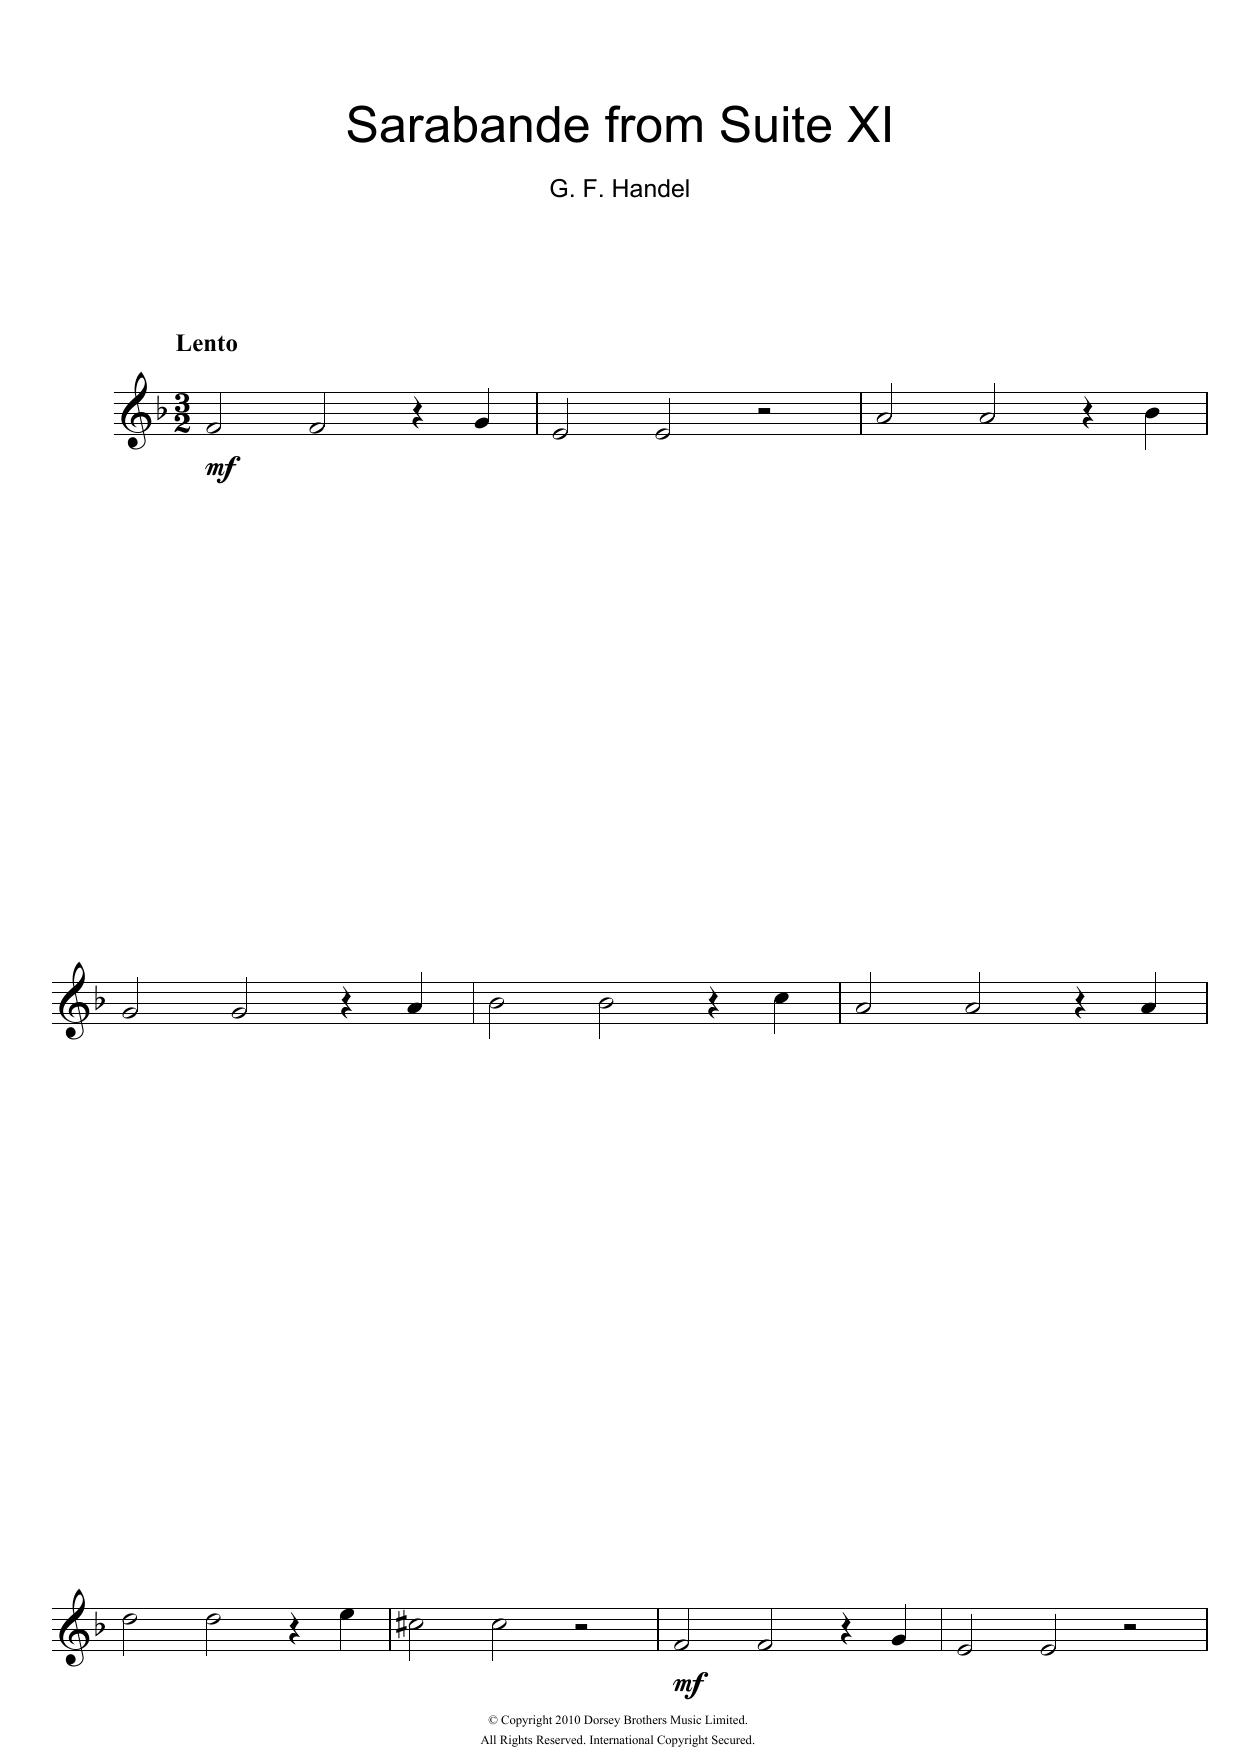 George Frideric Handel - Sarabande (from Suite XI)